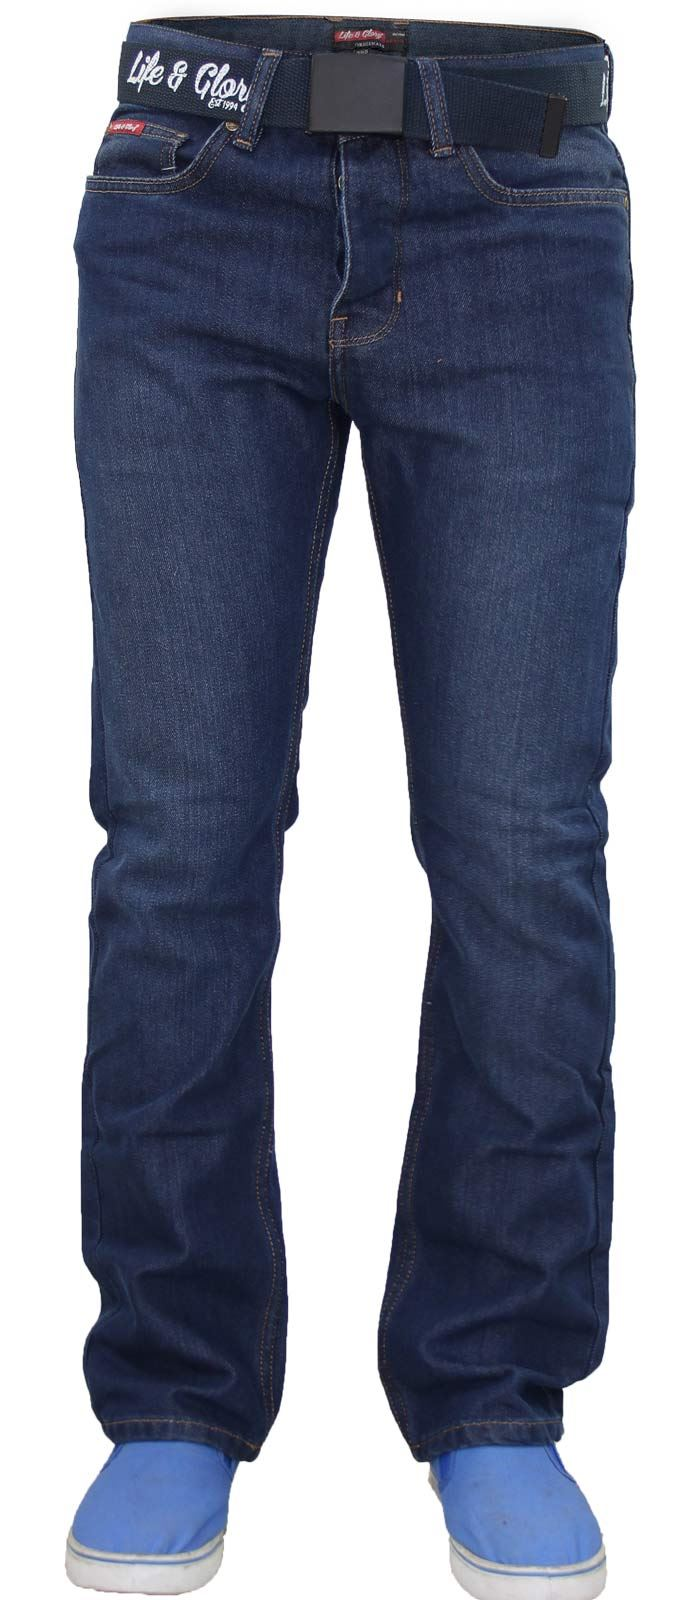 Mens-Regular-Fit-Jeans-Straight-Leg-Denim-Pants-Casual-Trousers-With-Free-Belt thumbnail 11